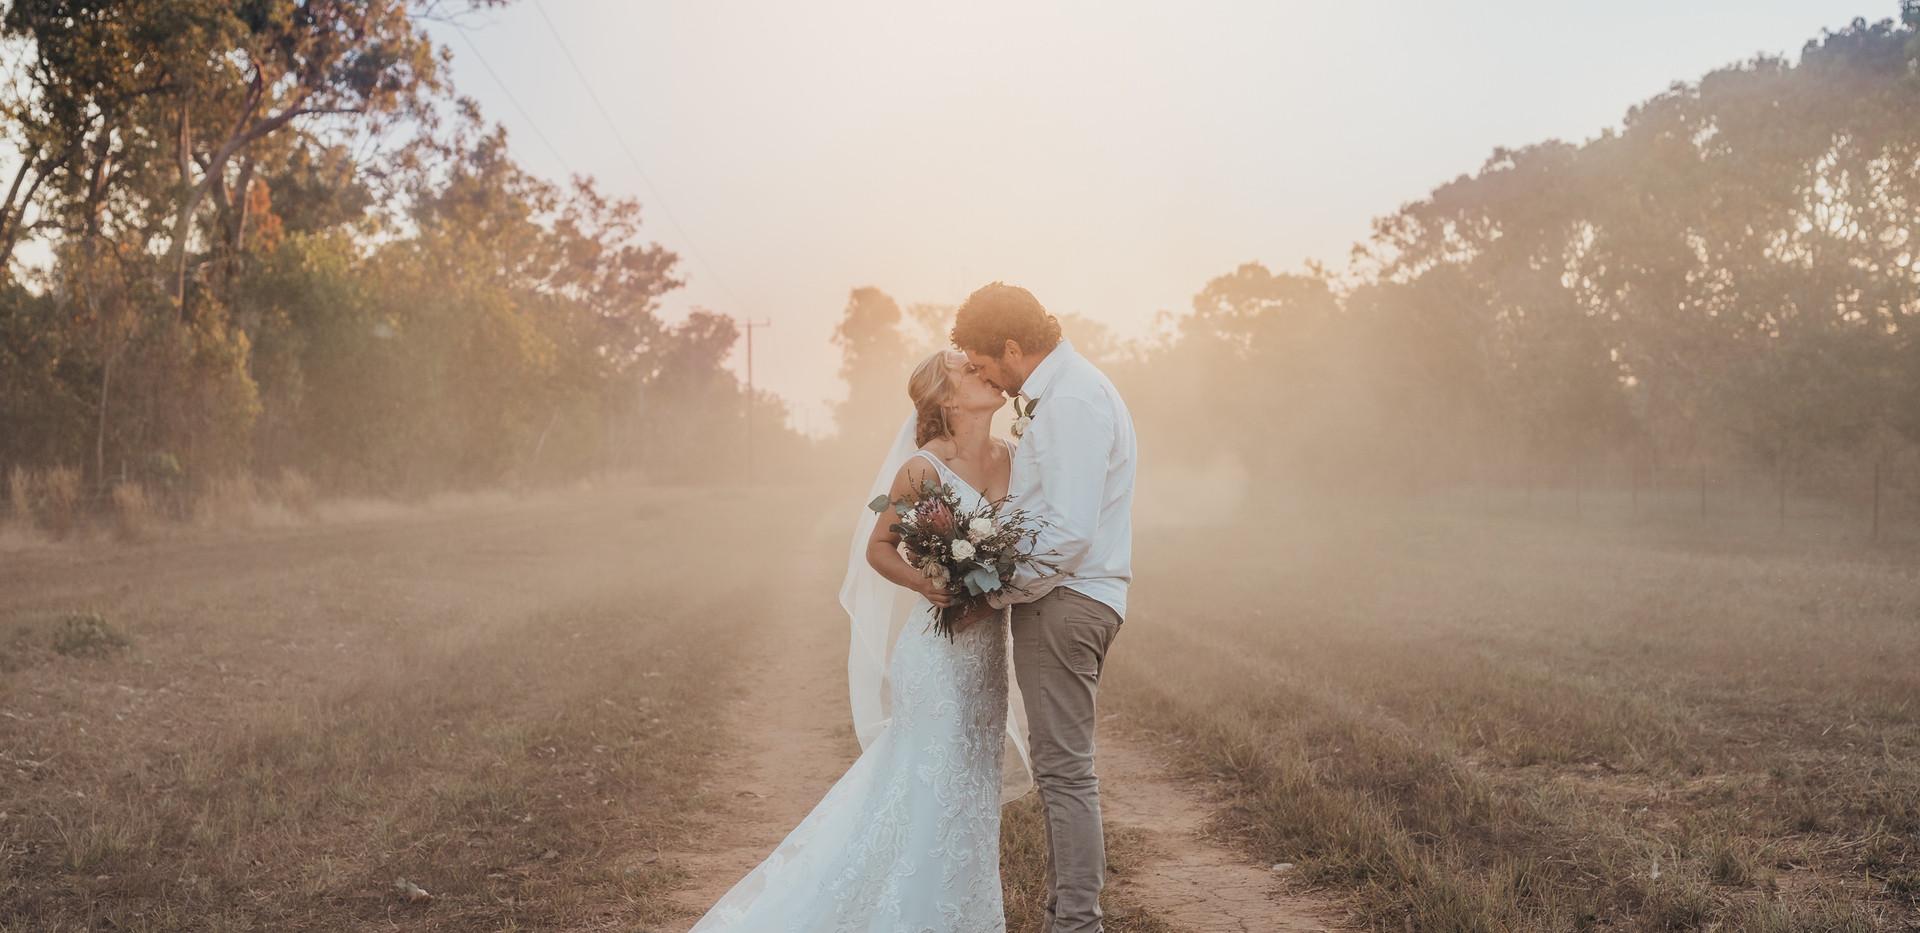 Darwin Wedding Photographer Videographer Video